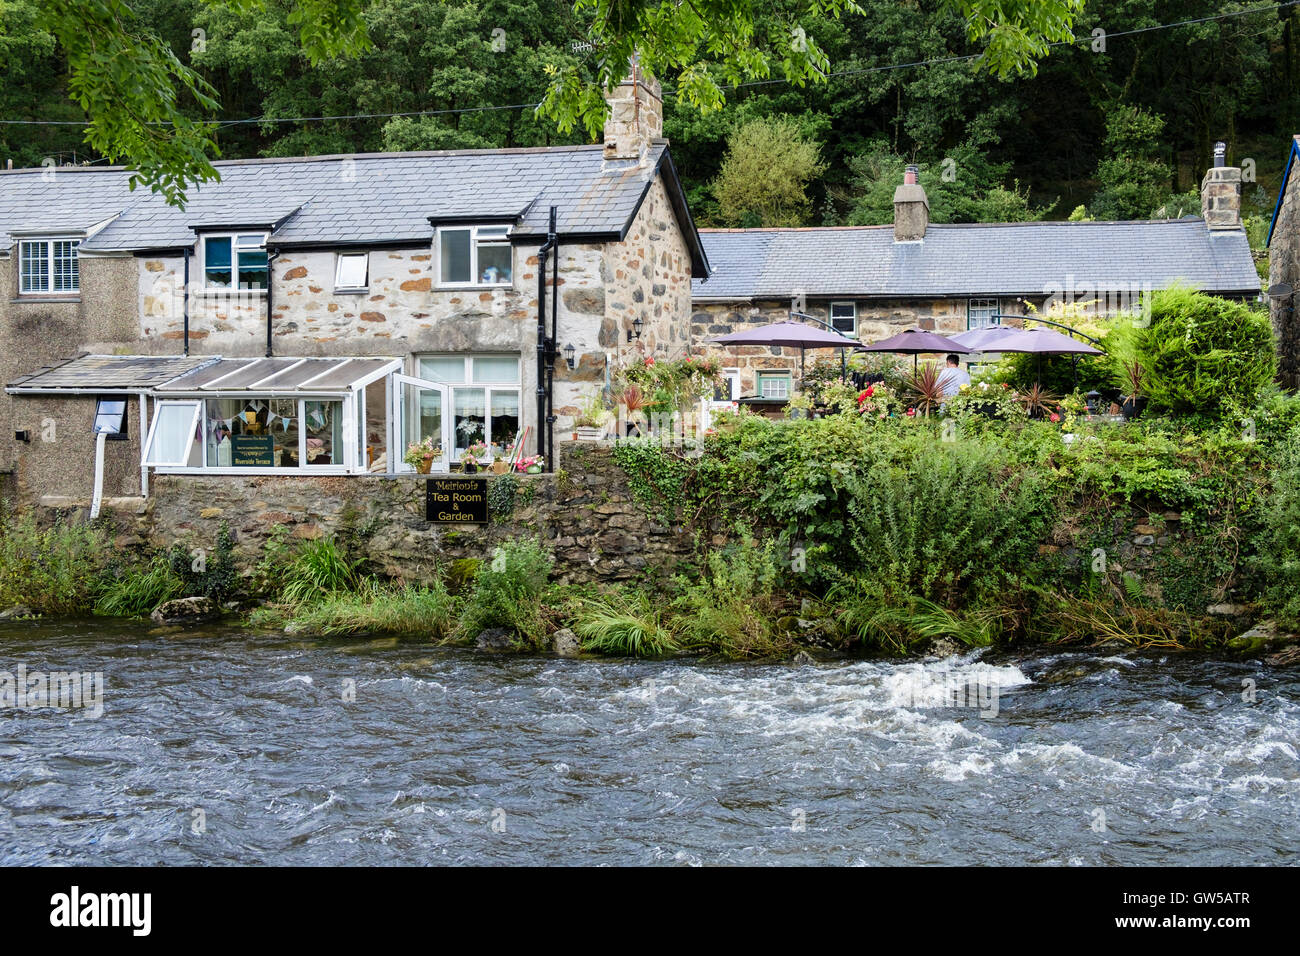 Meirionfa riverside Tea Room and Garden by Afon Glaslyn River in Beddgelert, Gwynedd, North Wales, UK, Britain Stock Photo